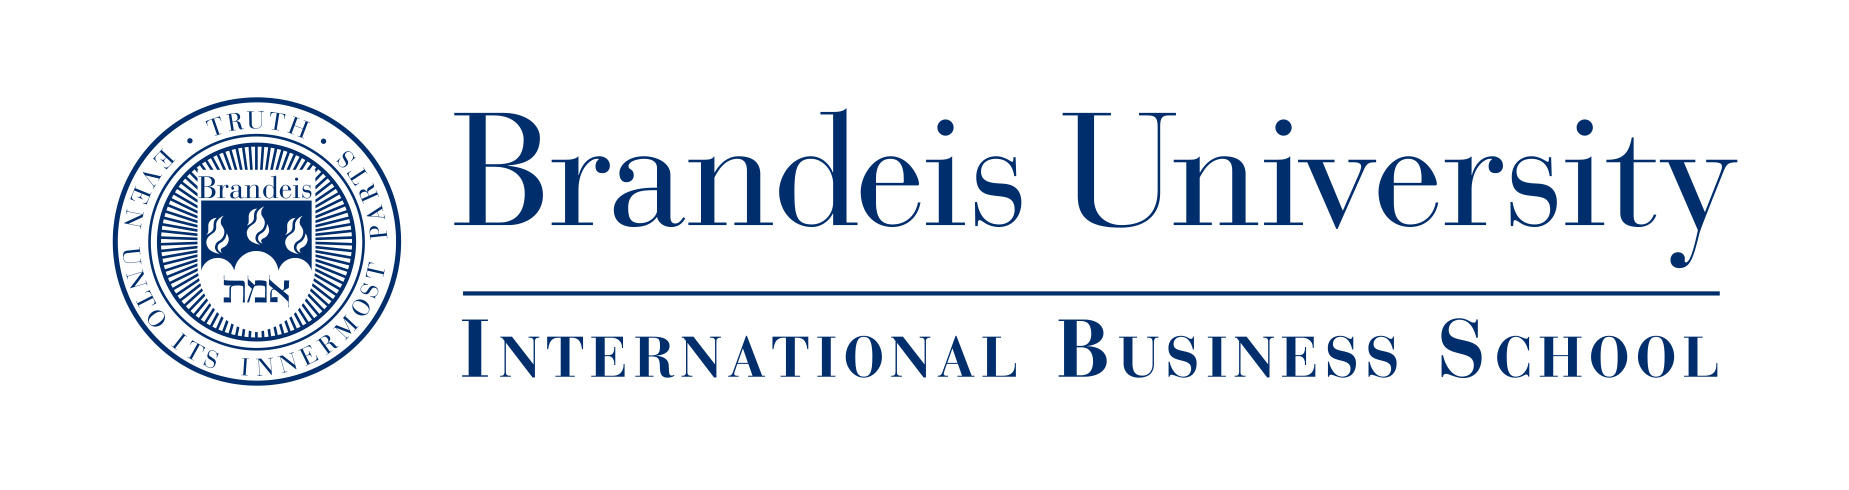 66 Brandeis University Overall Rankings 50 Great